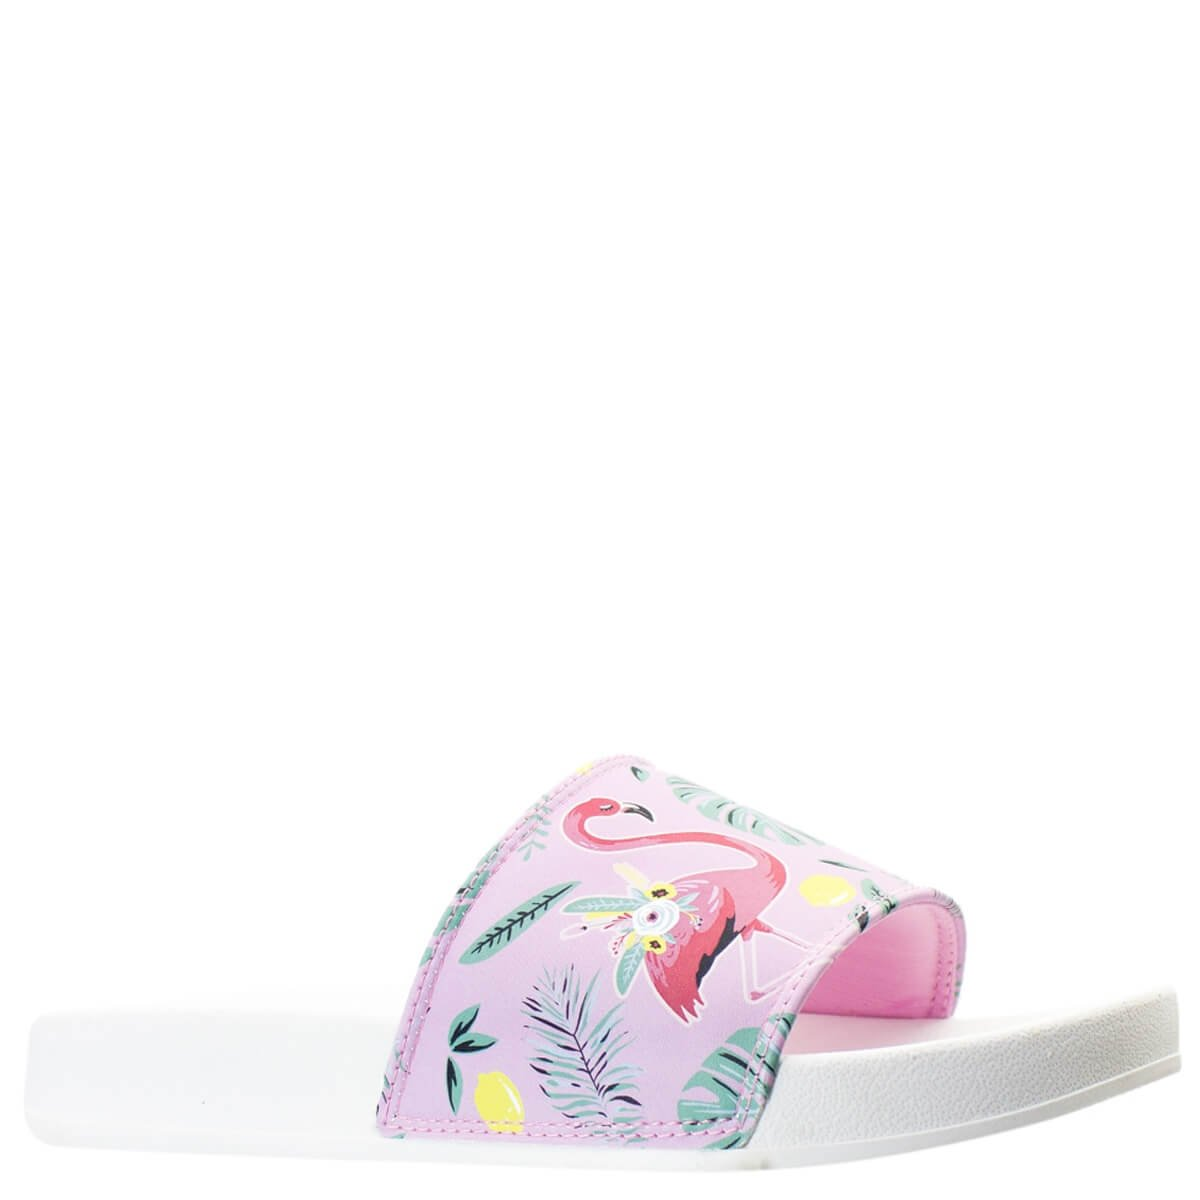 344e48cb7b Bizz Store - Chinelo Slide Feminino Capricho Flamingo